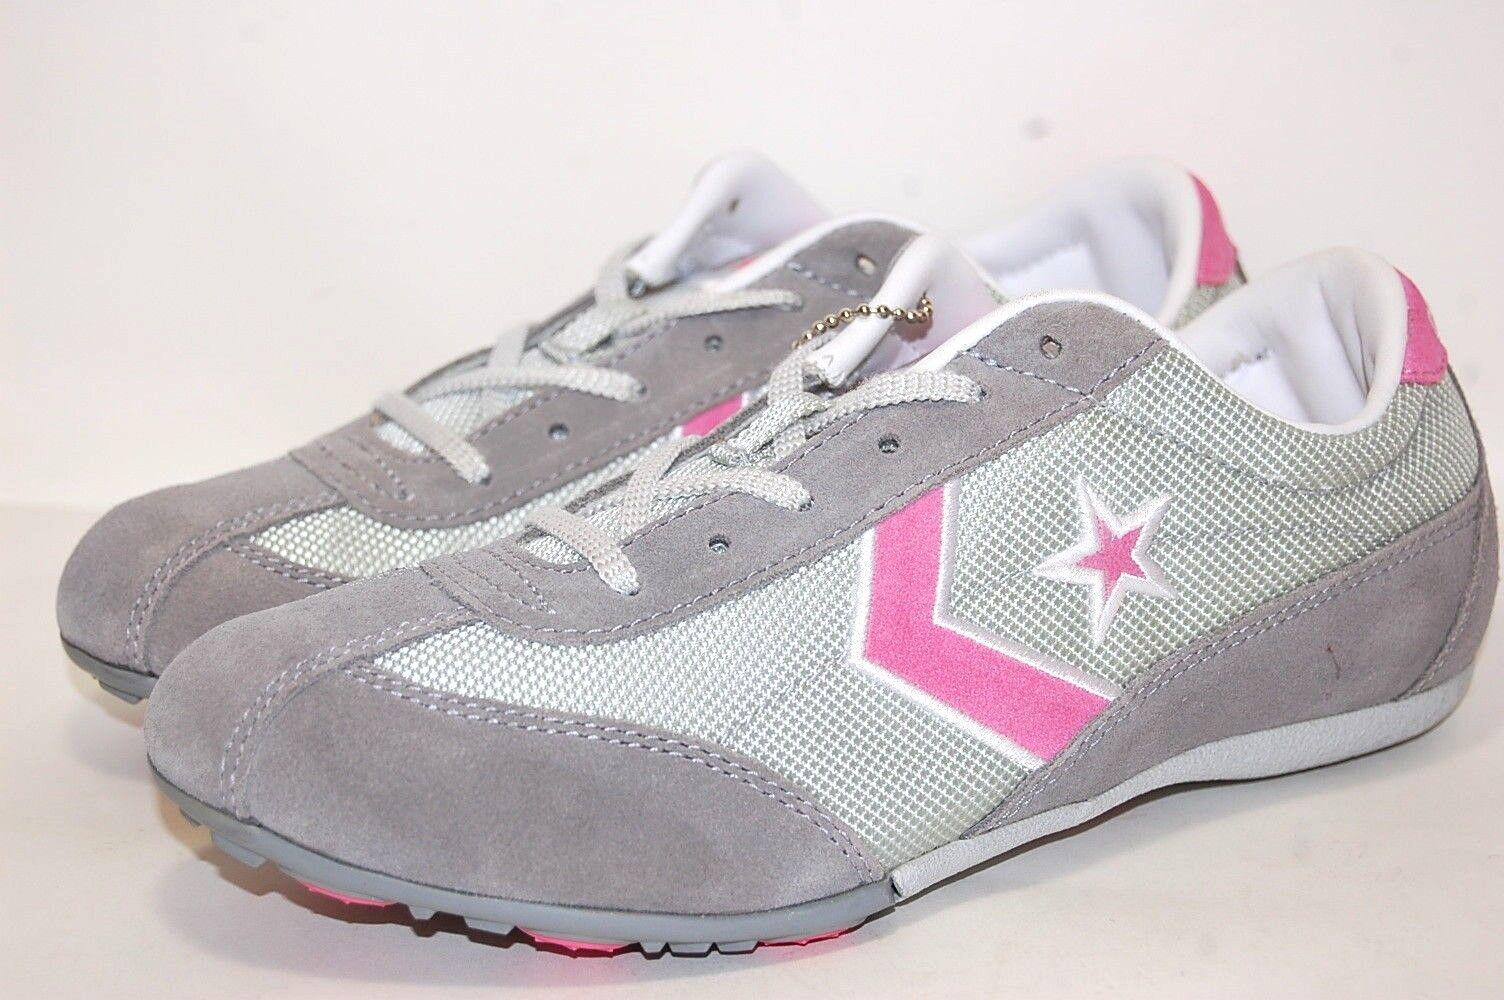 Converse Retro runner OX 1Q186 Grey Pink Women shoes